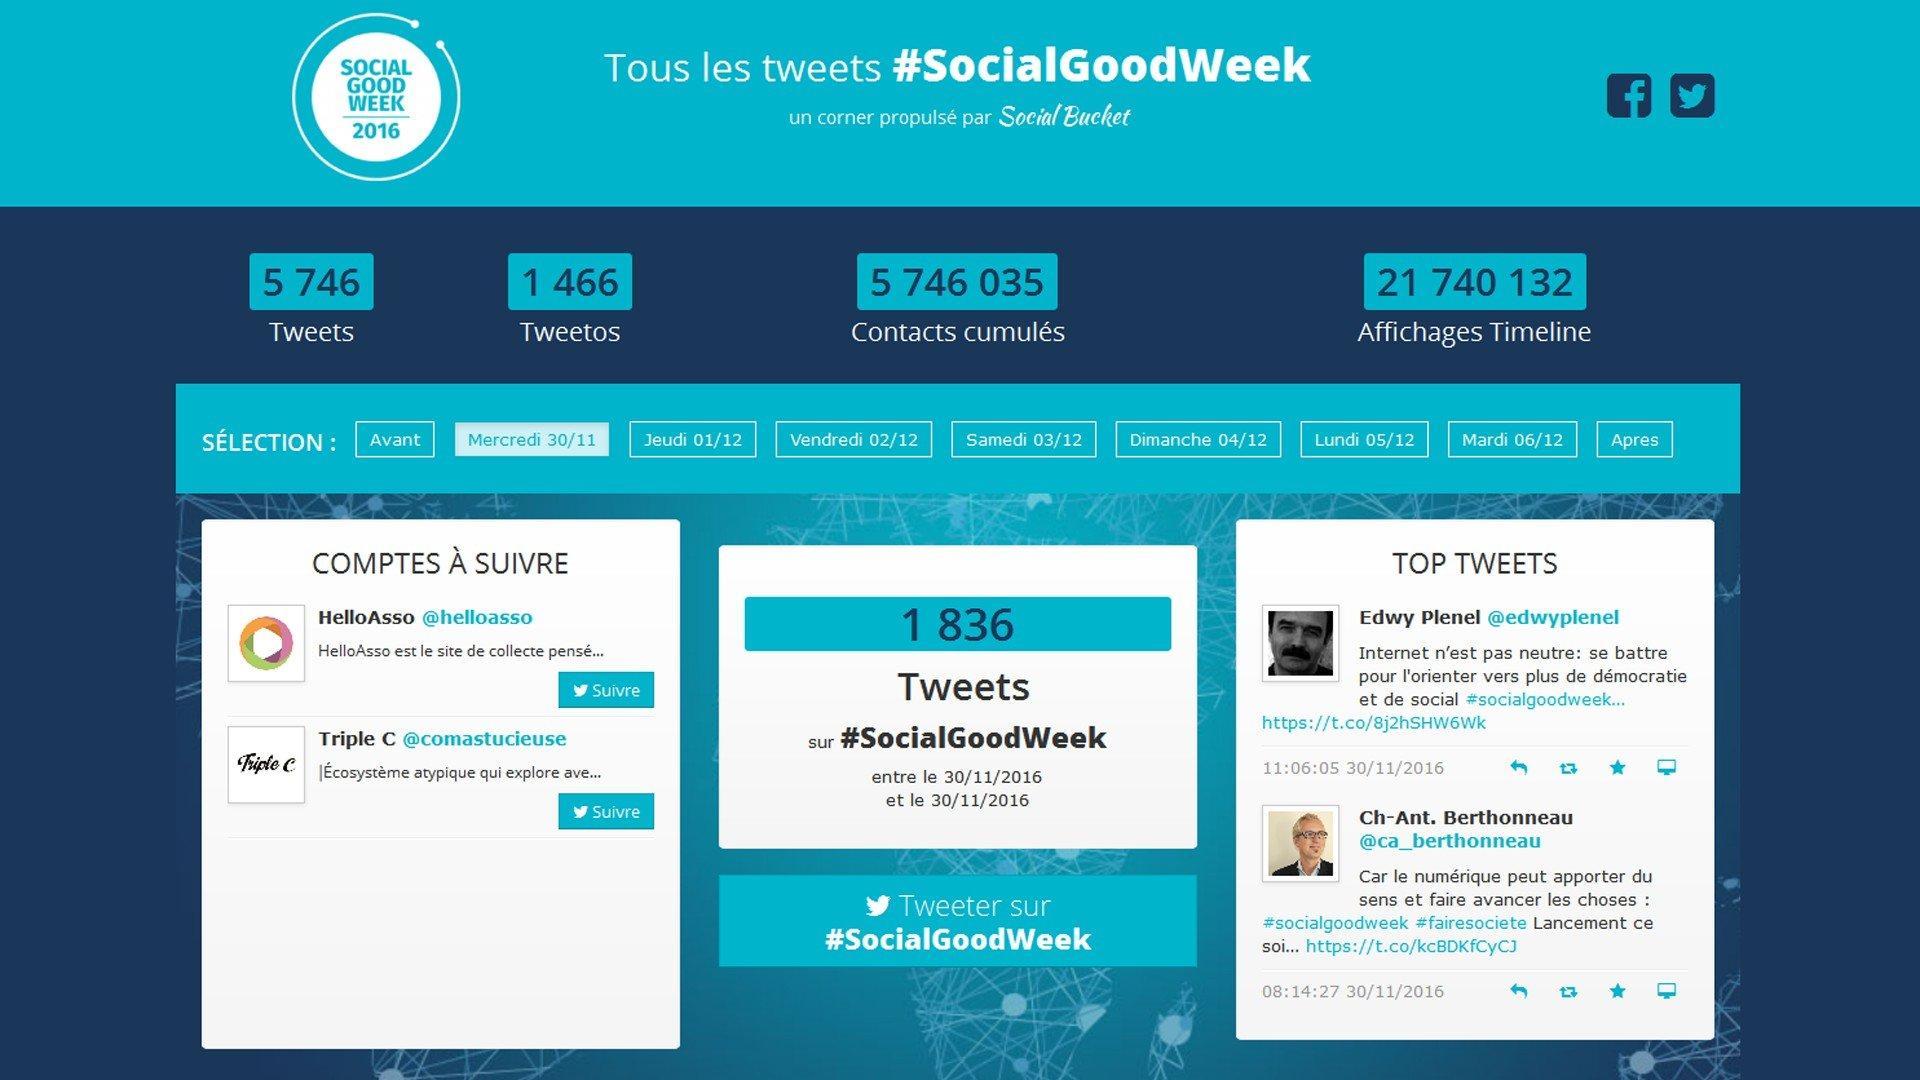 #SocialGoodWeek sur Social Bucket